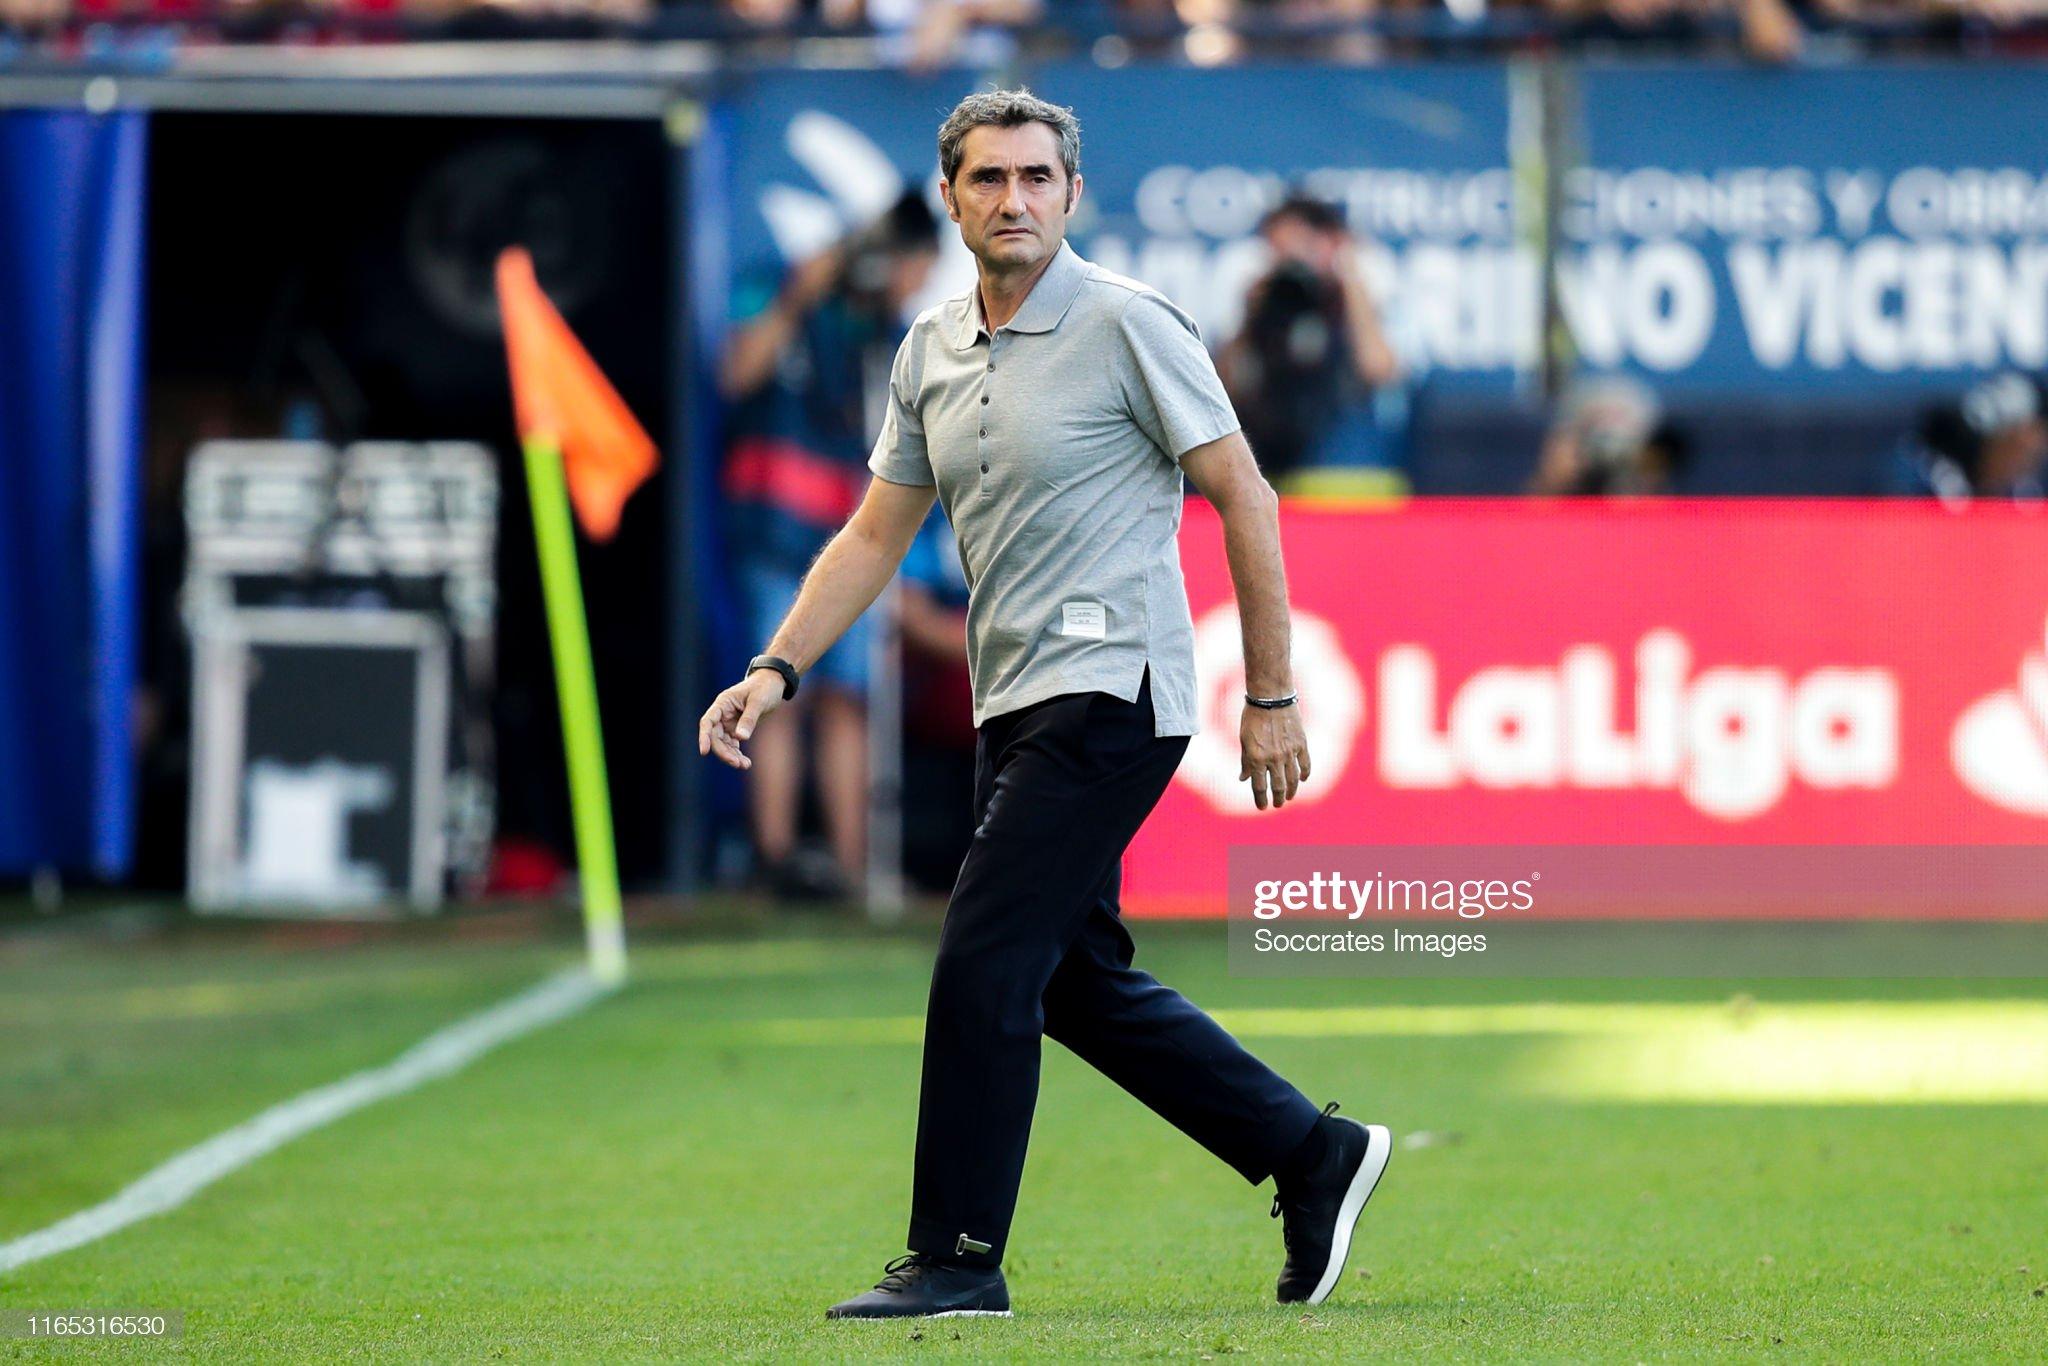 صور مباراة : أوساسونا - برشلونة 2-2 ( 31-08-2019 )  Coach-ernesto-valverde-of-fc-barcelona-during-the-la-liga-santander-picture-id1165316530?s=2048x2048